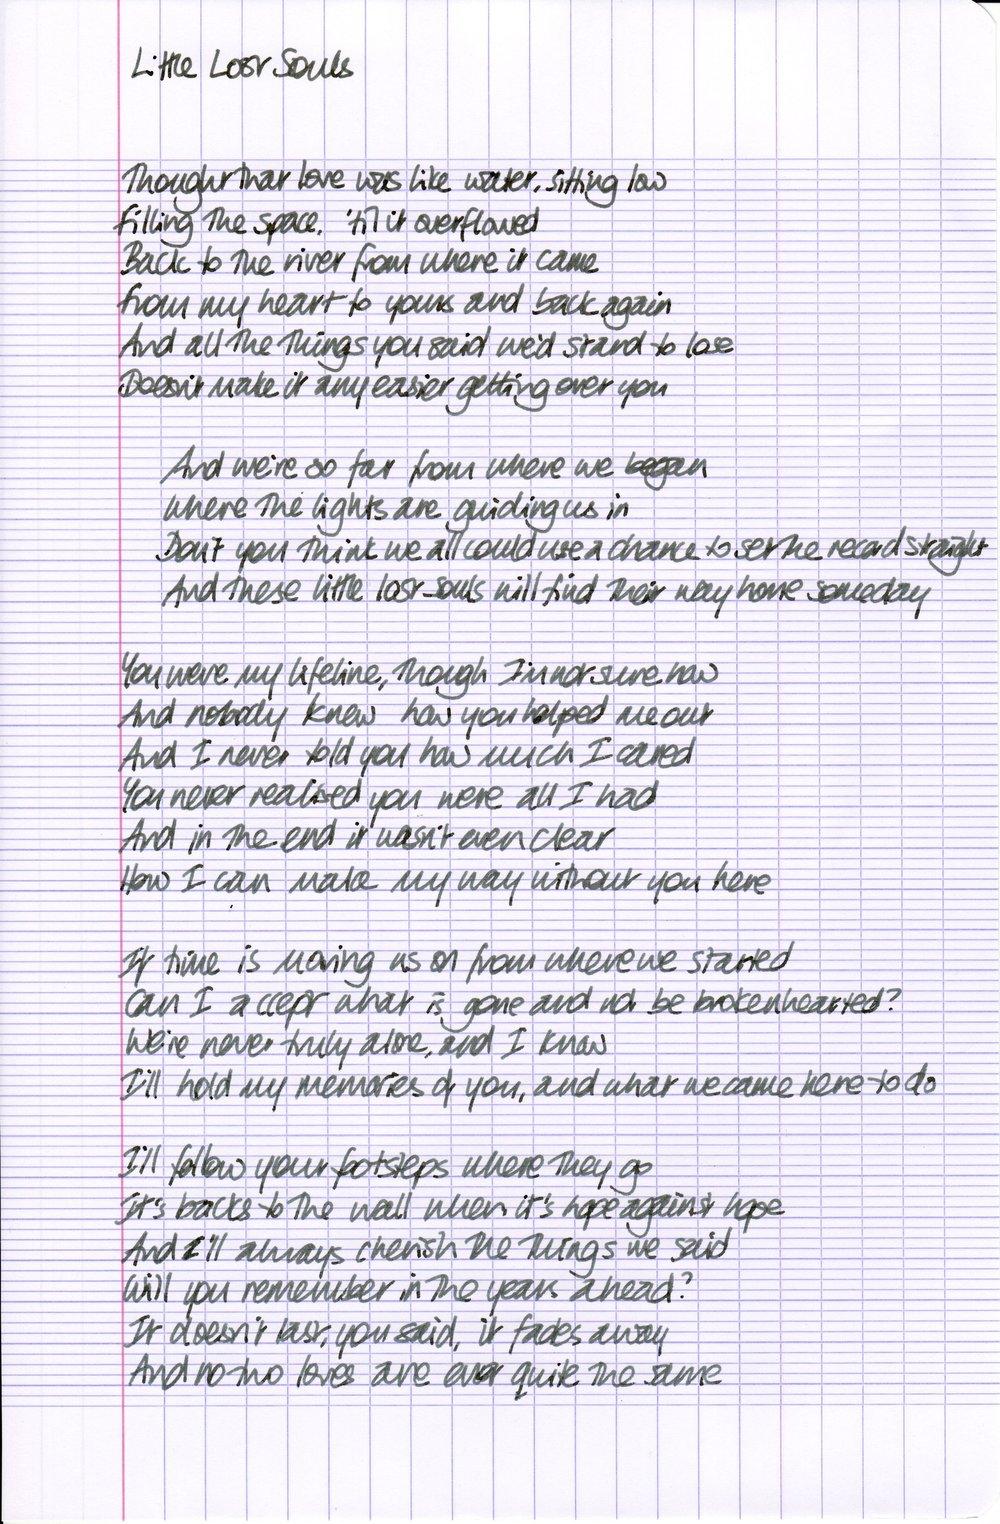 Little Lost Souls Lyrics.jpeg